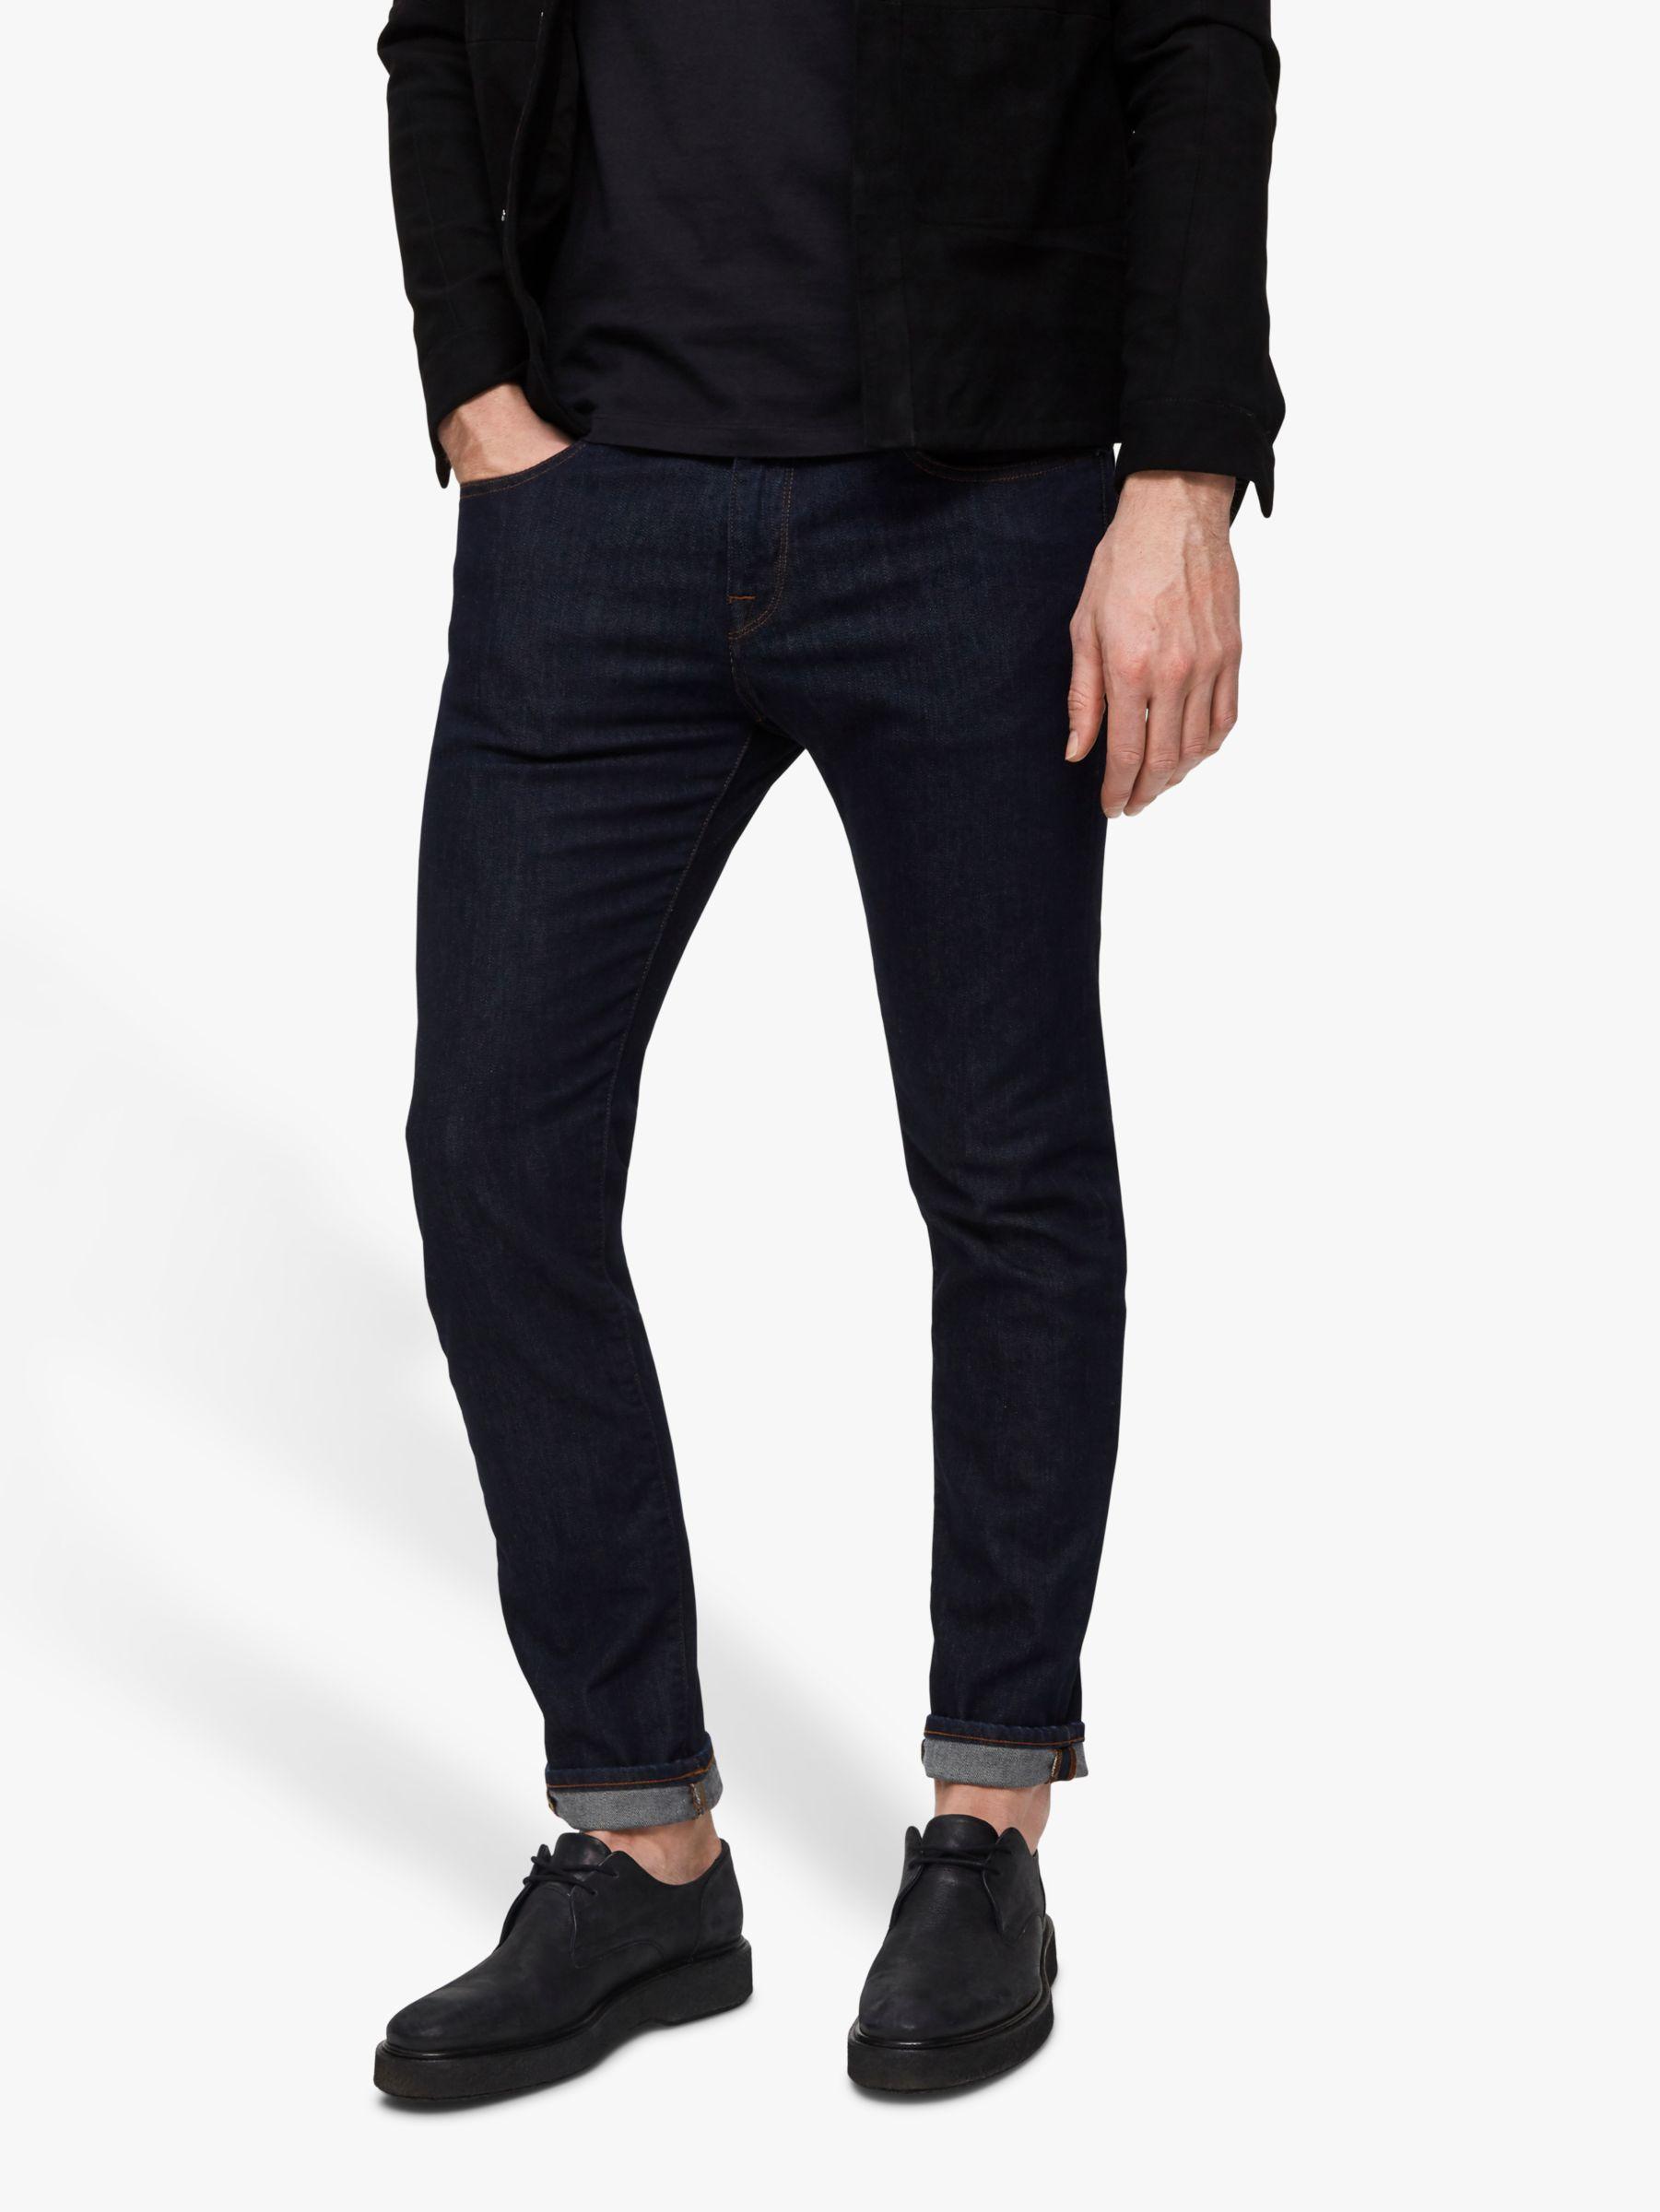 Selected Homme SELECTED HOMME Leon Slim Jeans, Dark Rinse